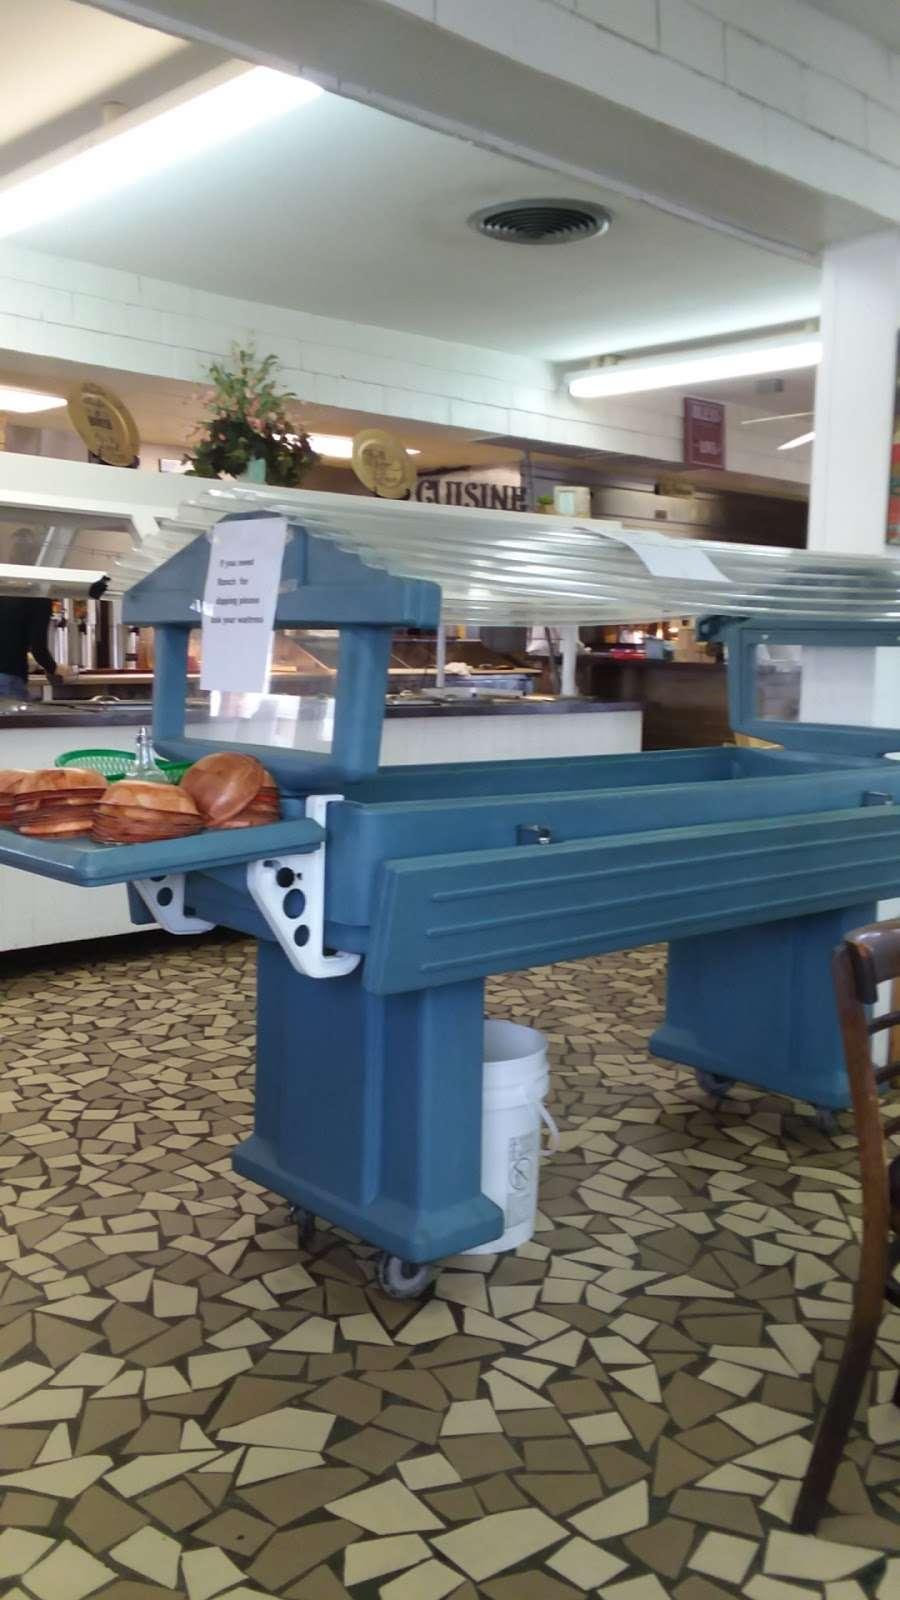 Christines Wagon Wheel - restaurant  | Photo 10 of 10 | Address: 204 W Main St, Marshville, NC 28103, USA | Phone: (704) 624-2057